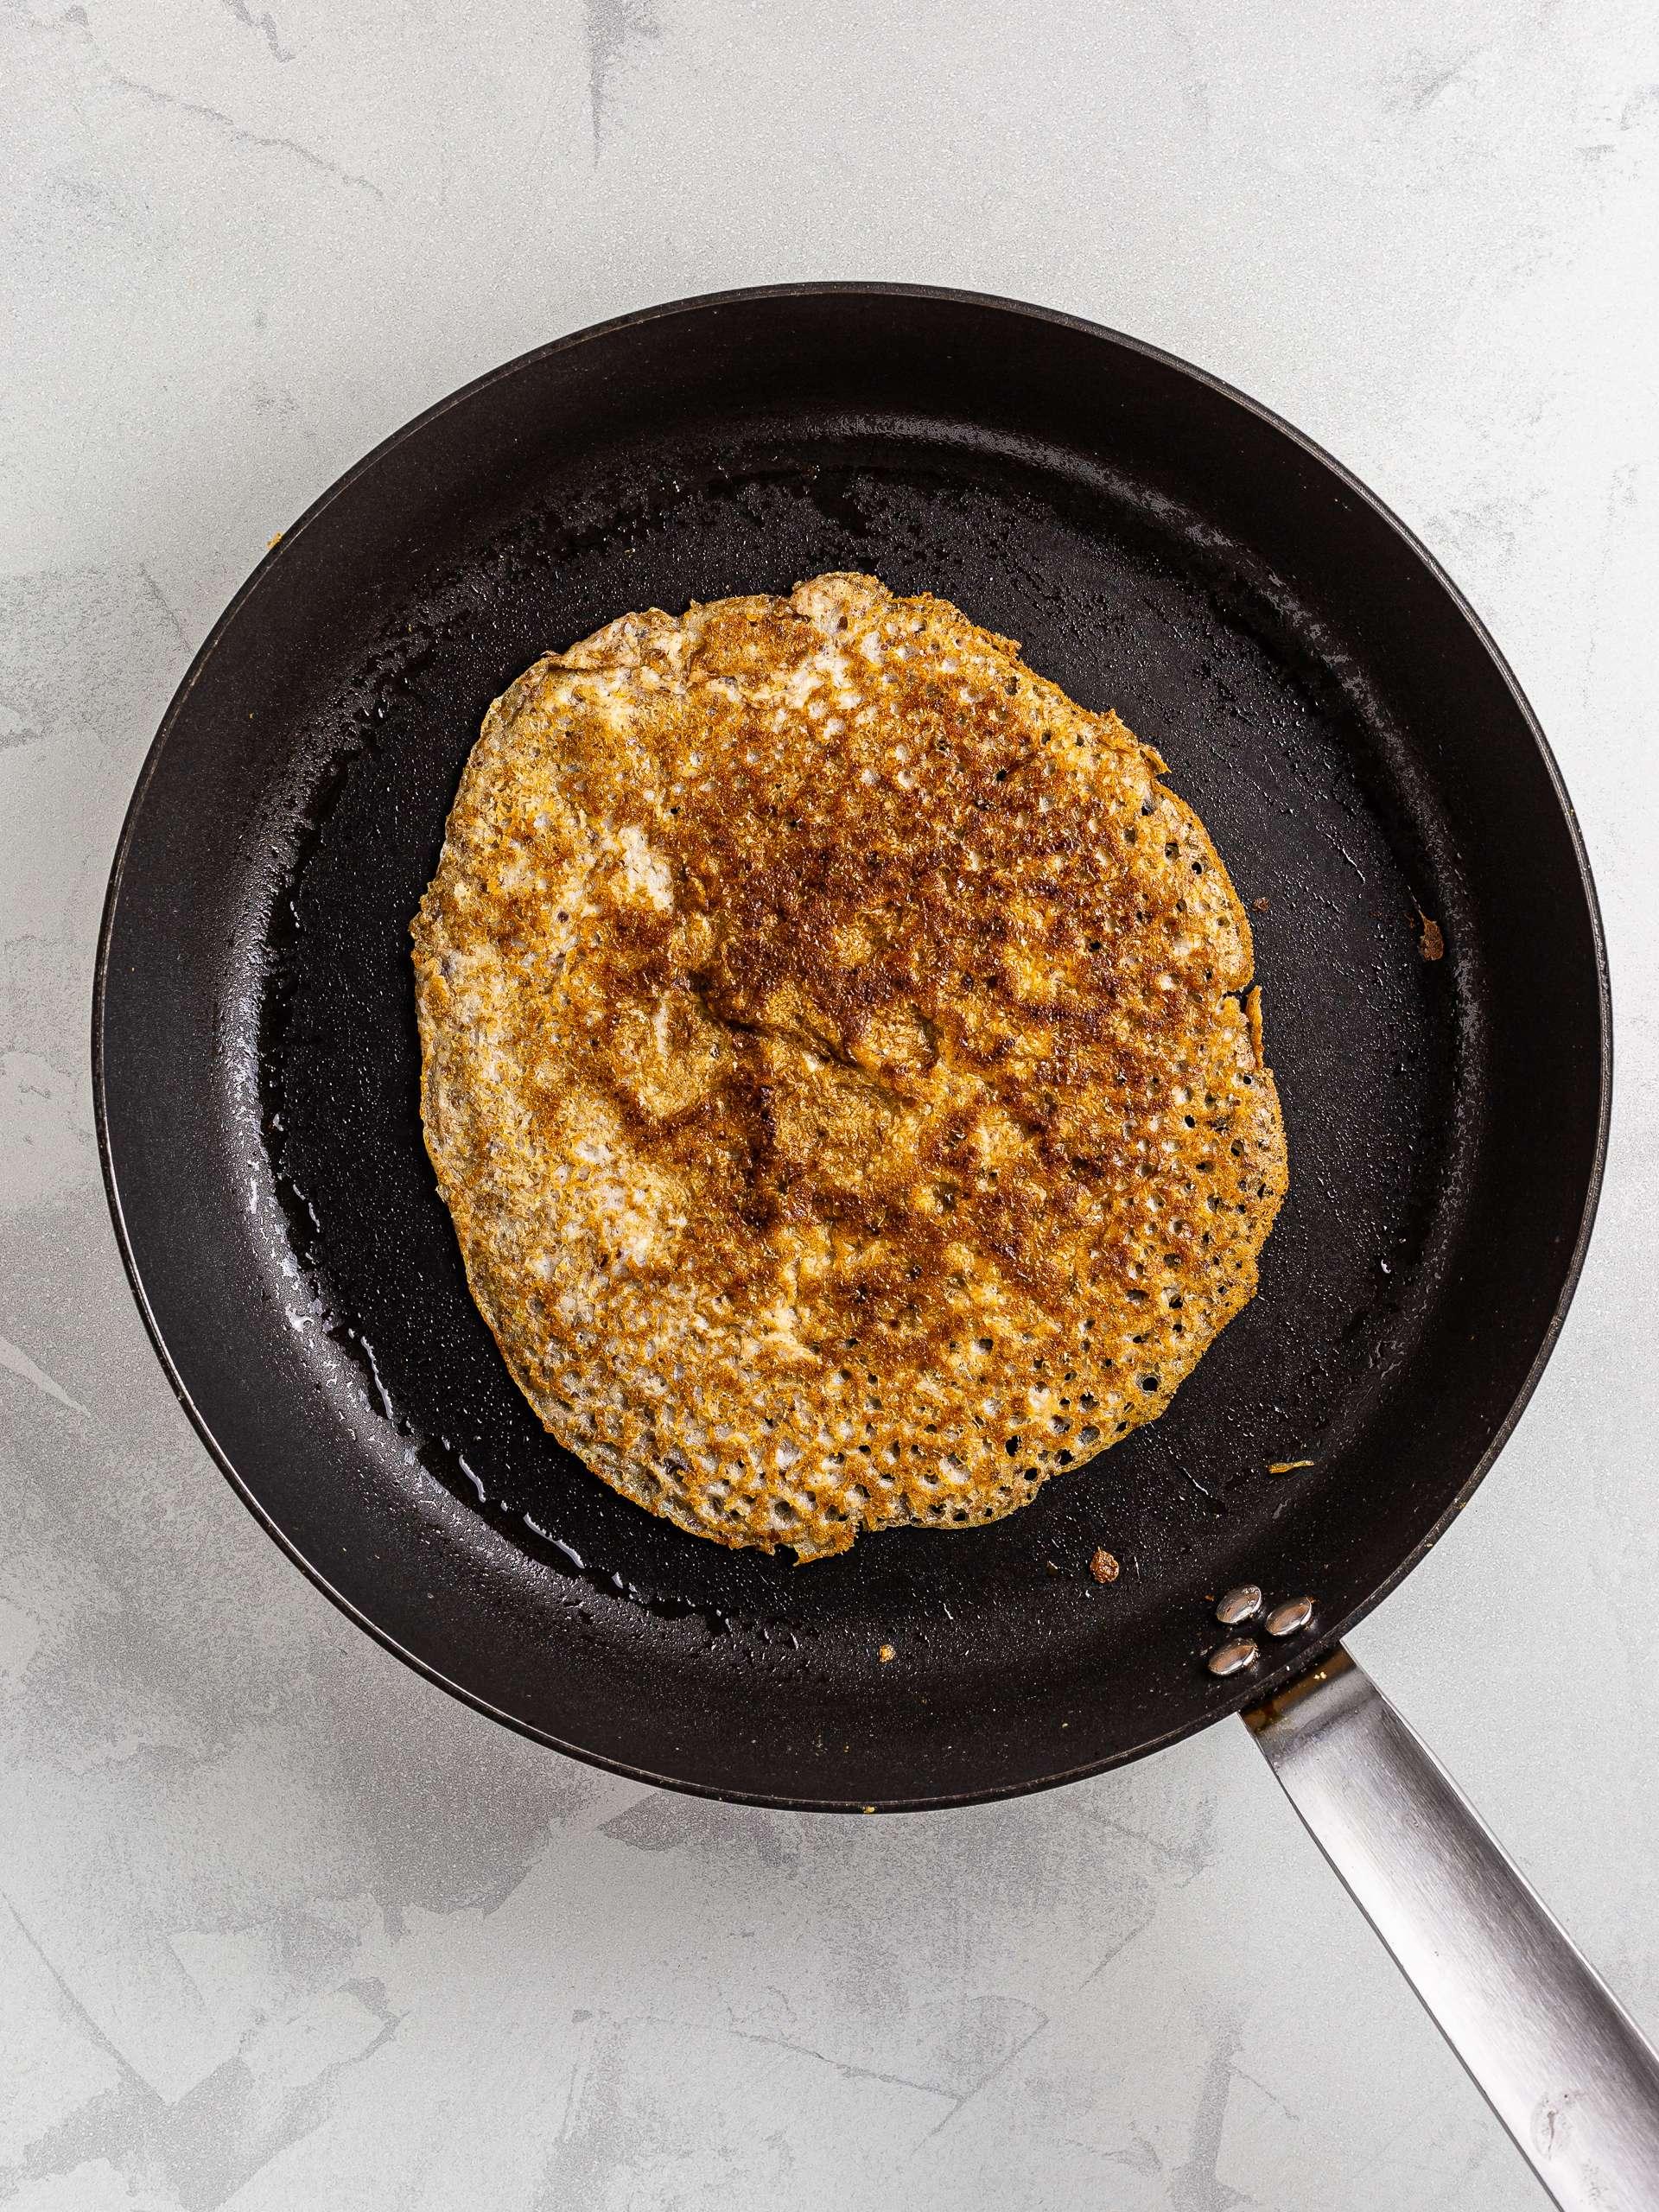 cooked almond milk crepe